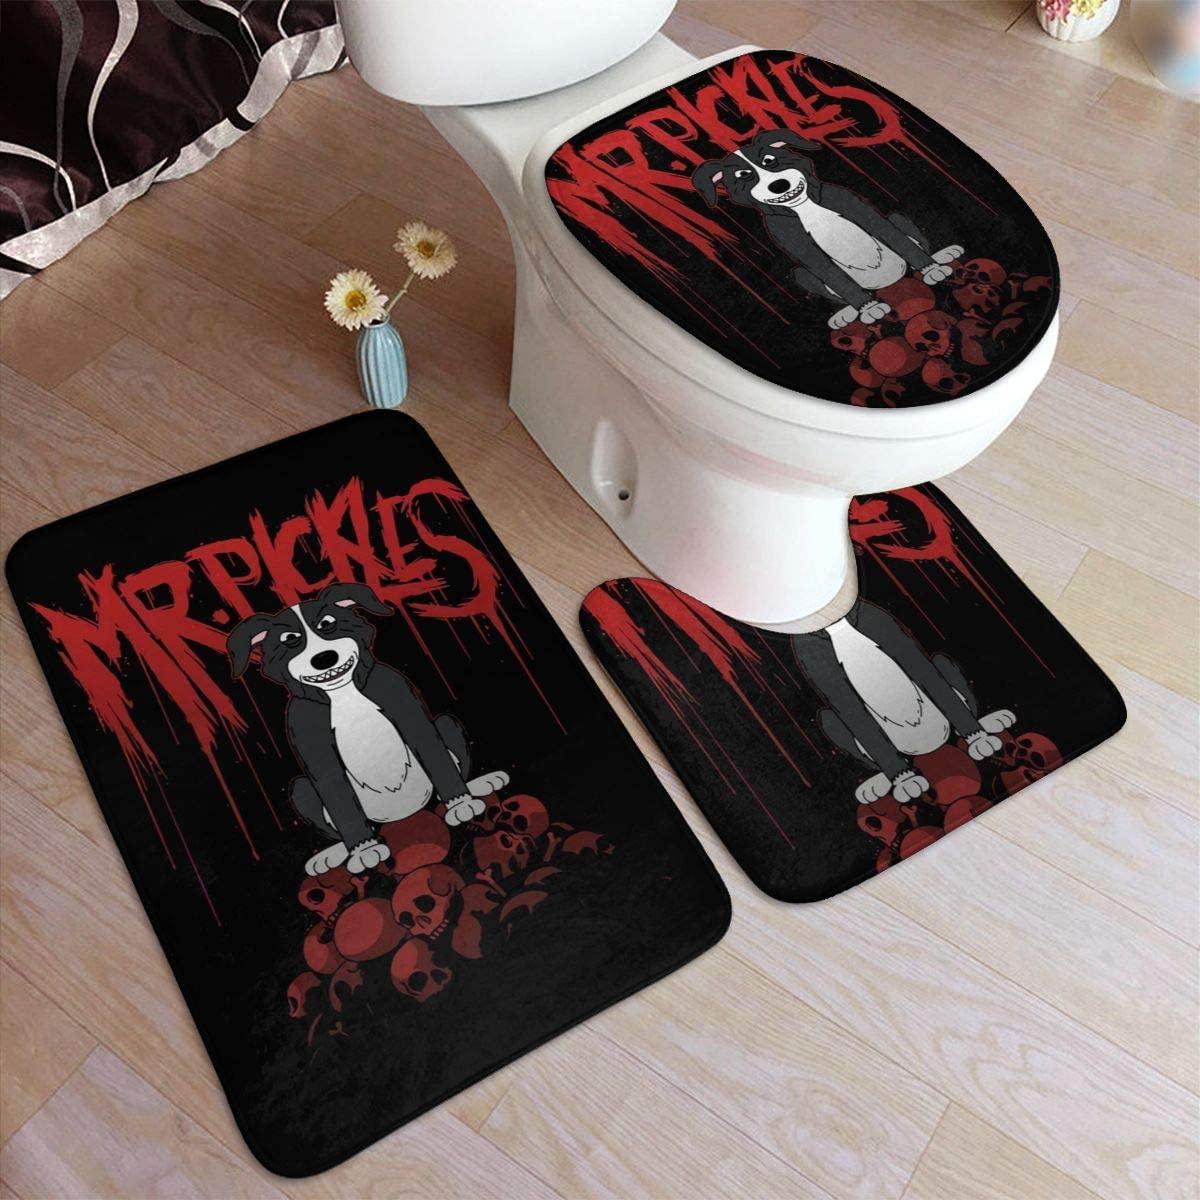 Mr. Pickles Bathroom Rug Mats Set 3 Piece Anti-Skid Pads Bath Mat + Contour + Toilet Lid Cover Bathroom Antiskid Pad 19.5in31.5in